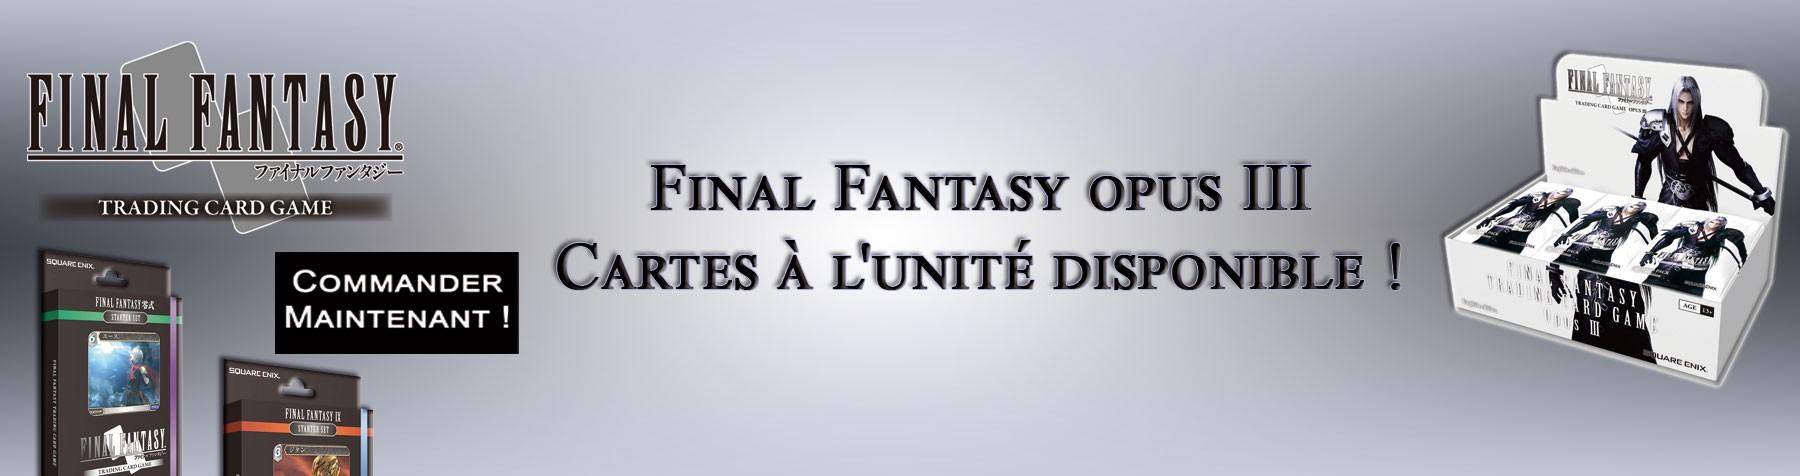 Final Fantasy Opus 3